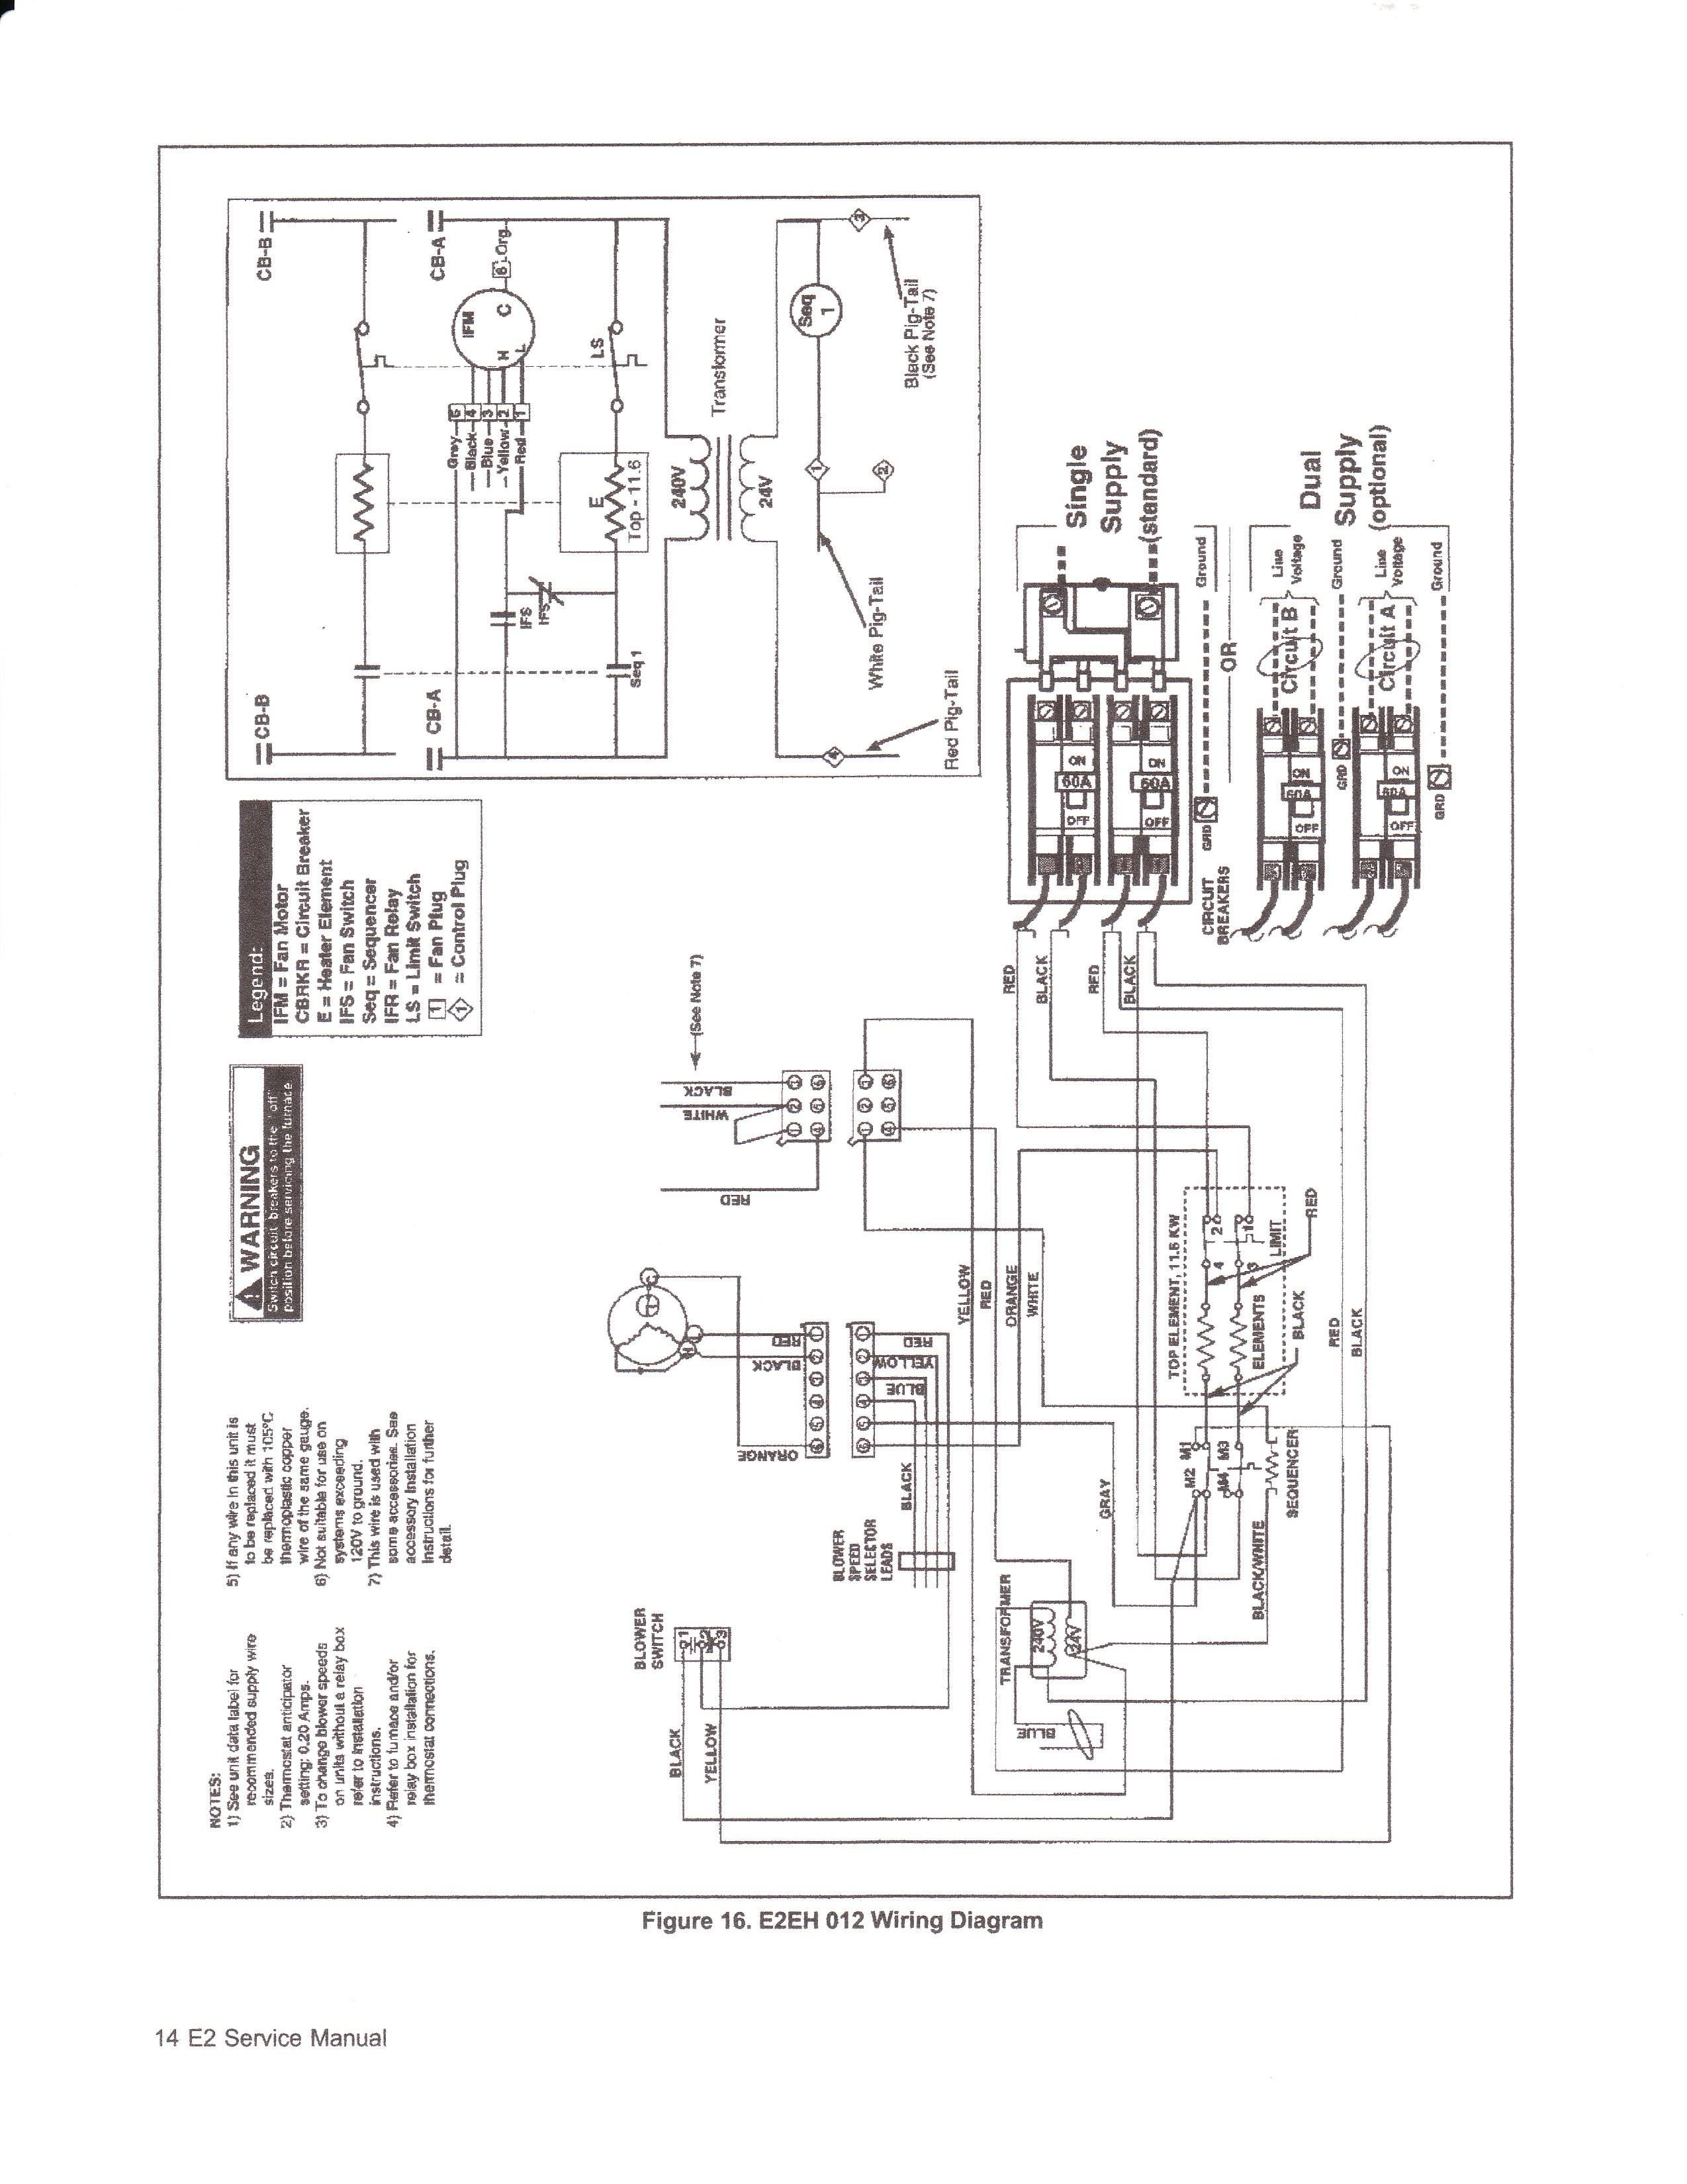 nordyne heat pump wiring diagram thermostat